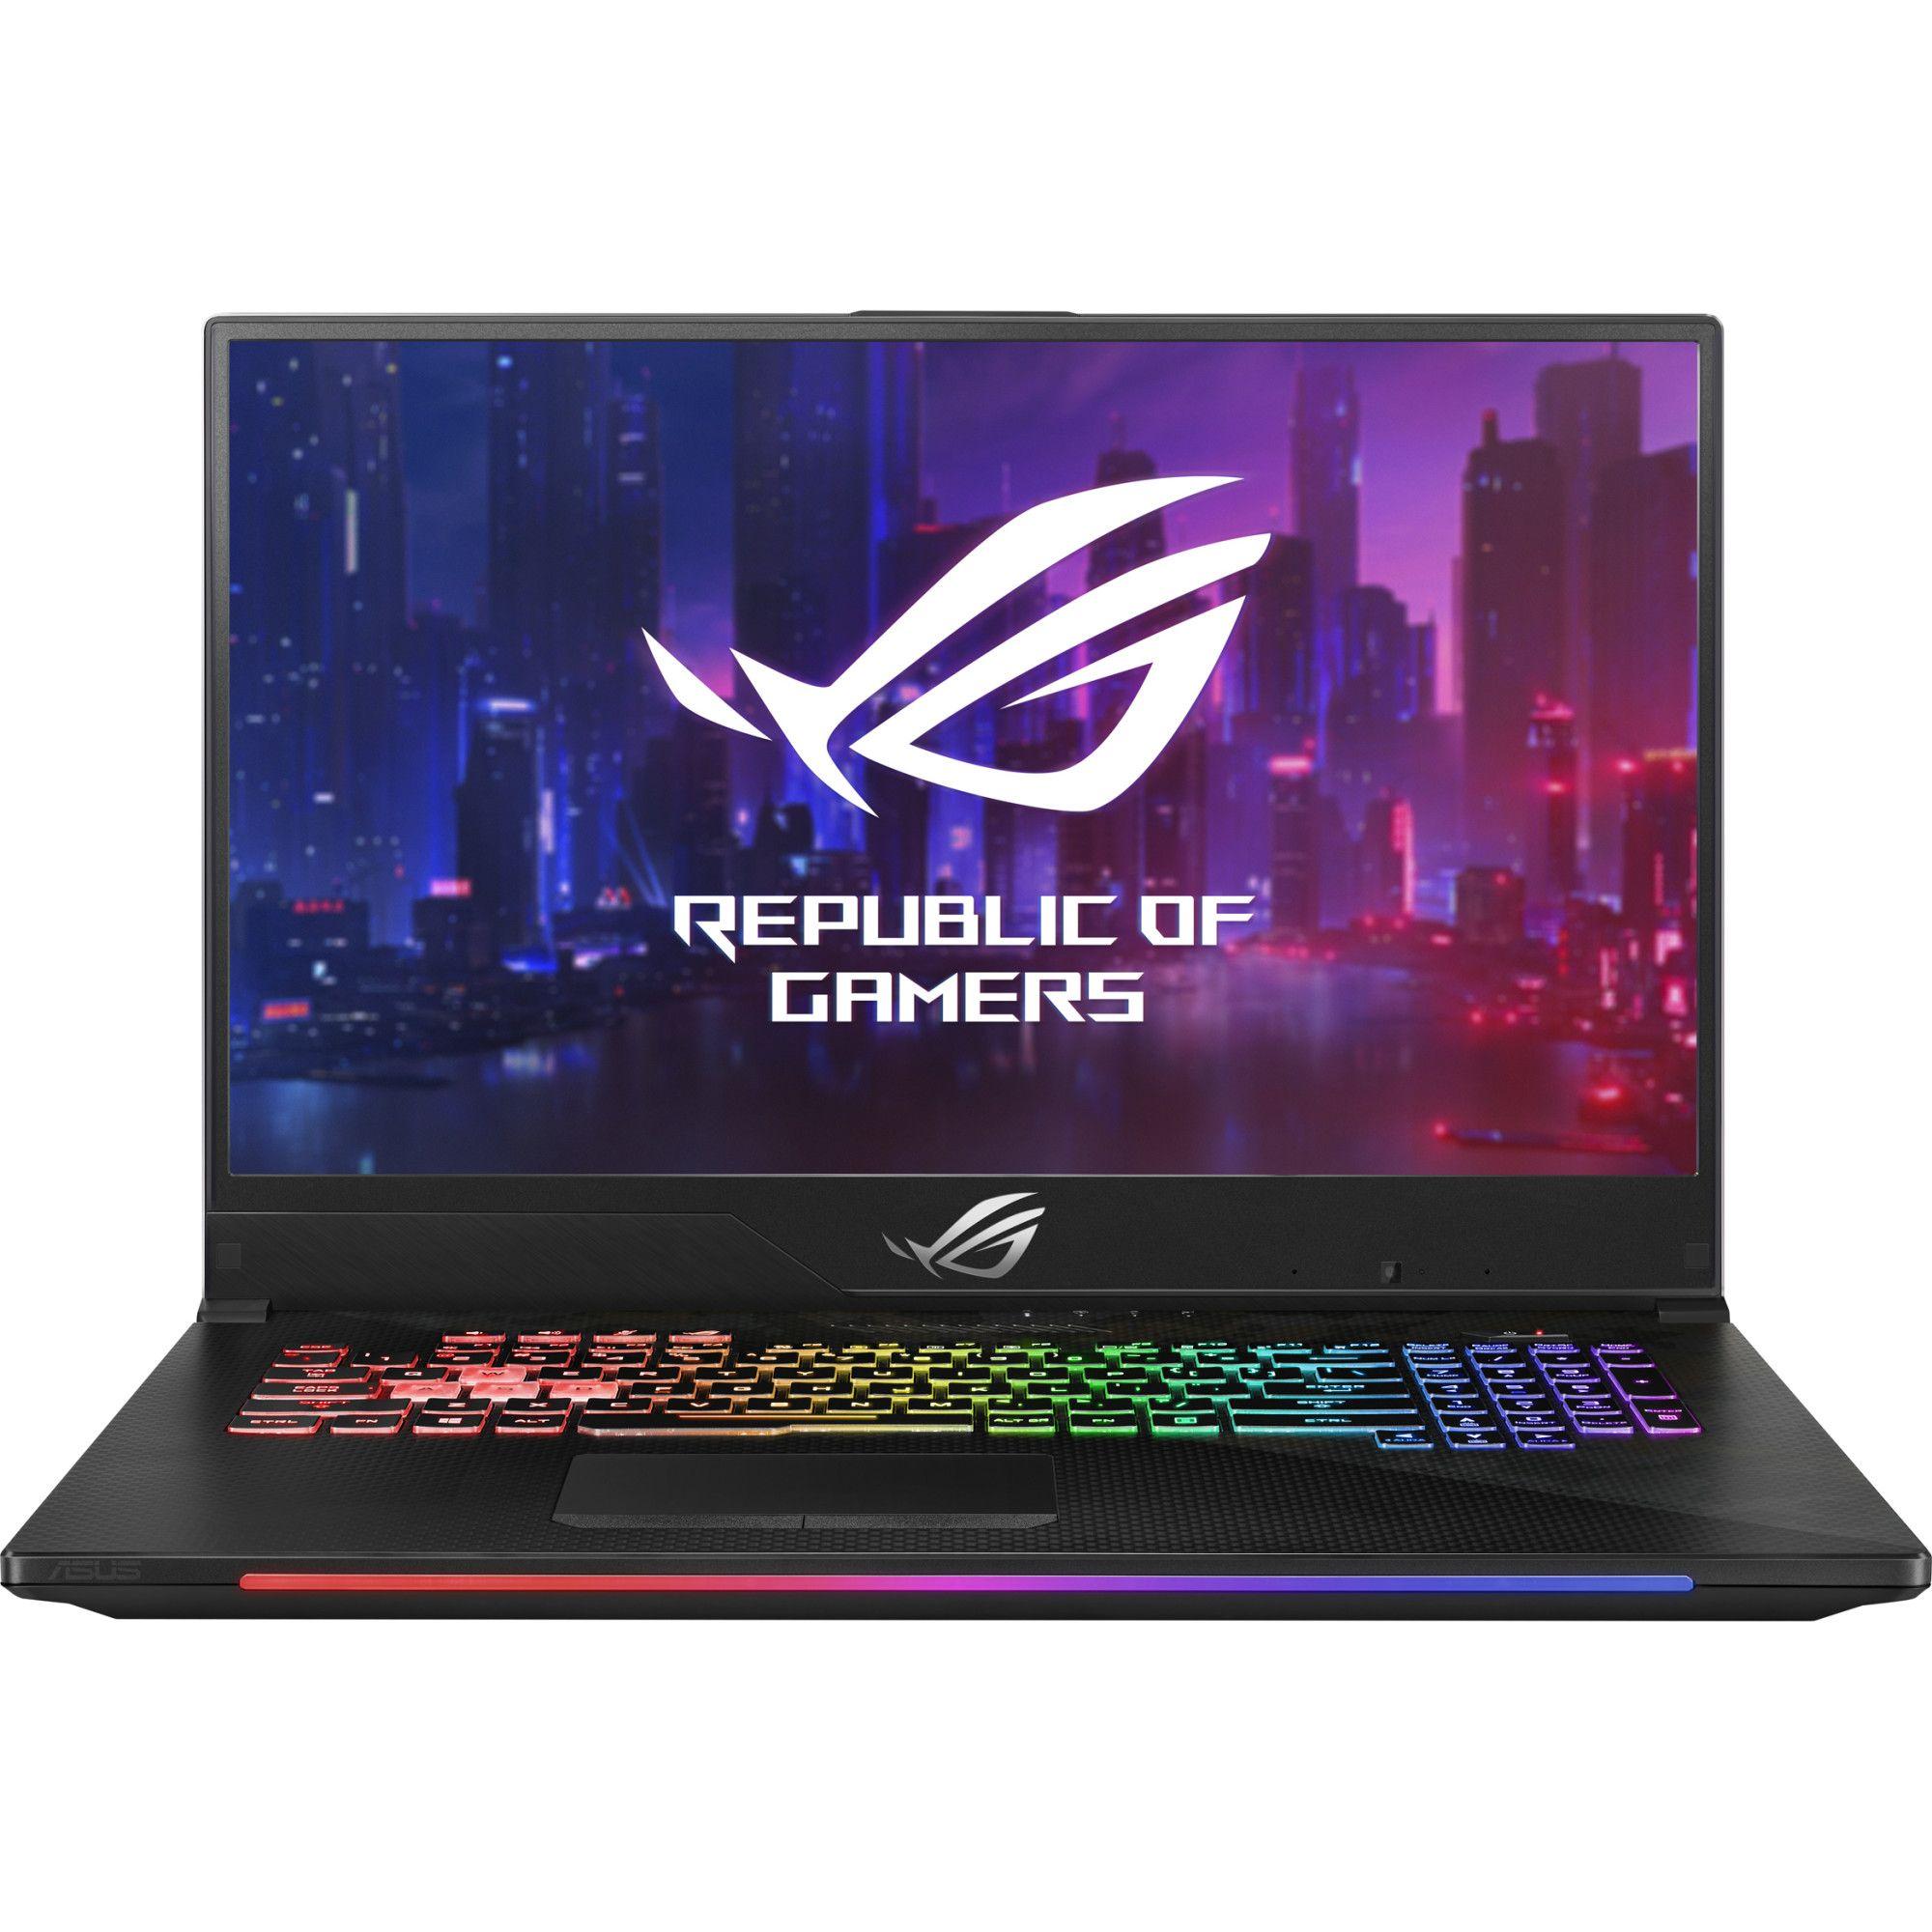 Notebook Asus ROG STRIX GL704GM 17.3 Full HD Intel Core i7-8750H GTX 1060-6GB RAM 8GB HDD 1TB + SSD 256GB No OS Negru